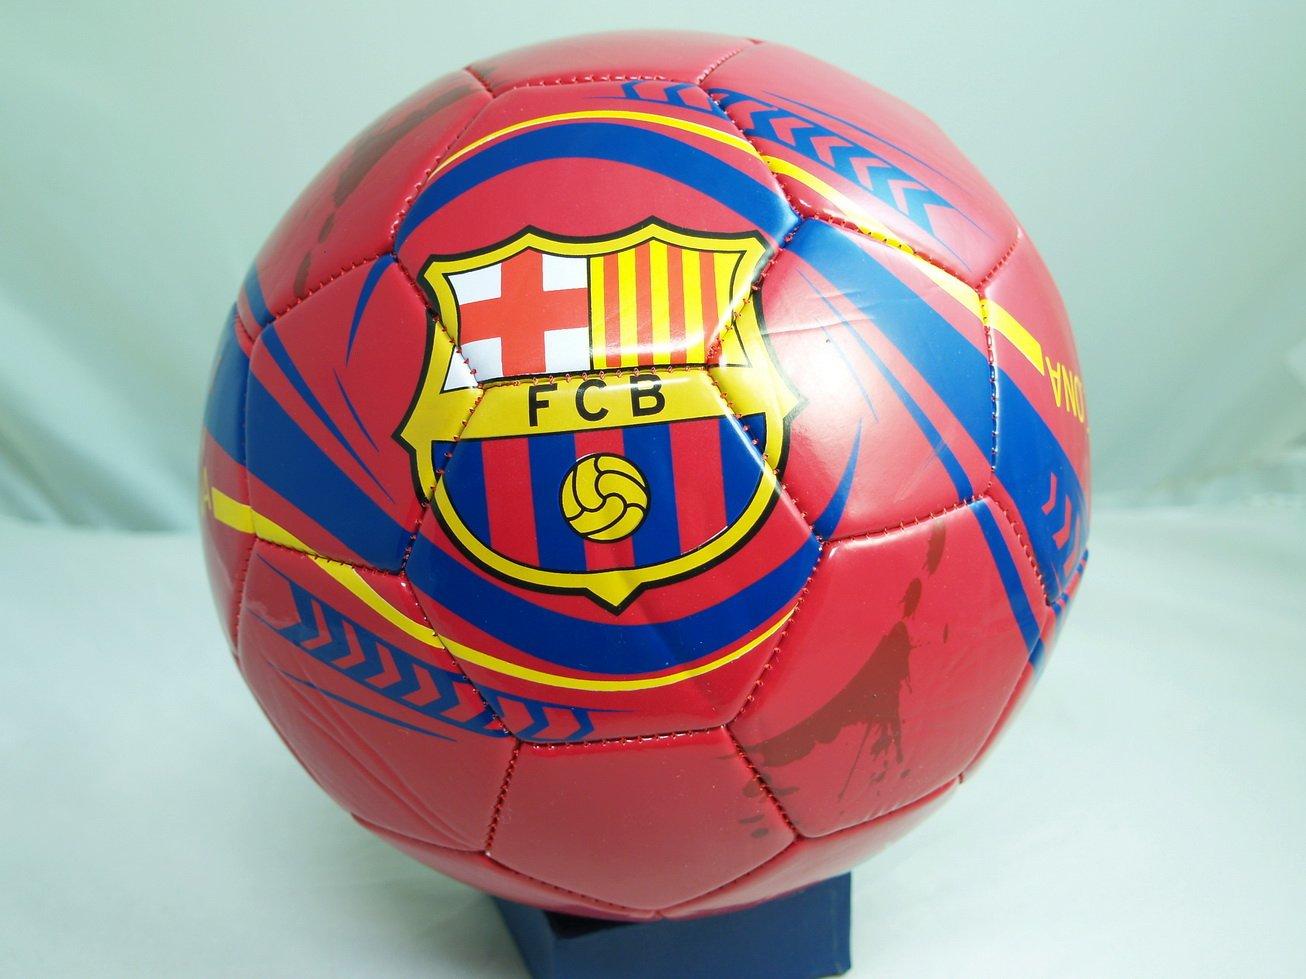 FCバルセロナサッカー公式サイズサッカーボール( SZ。5 ) – ブルー   B0056CGTLG